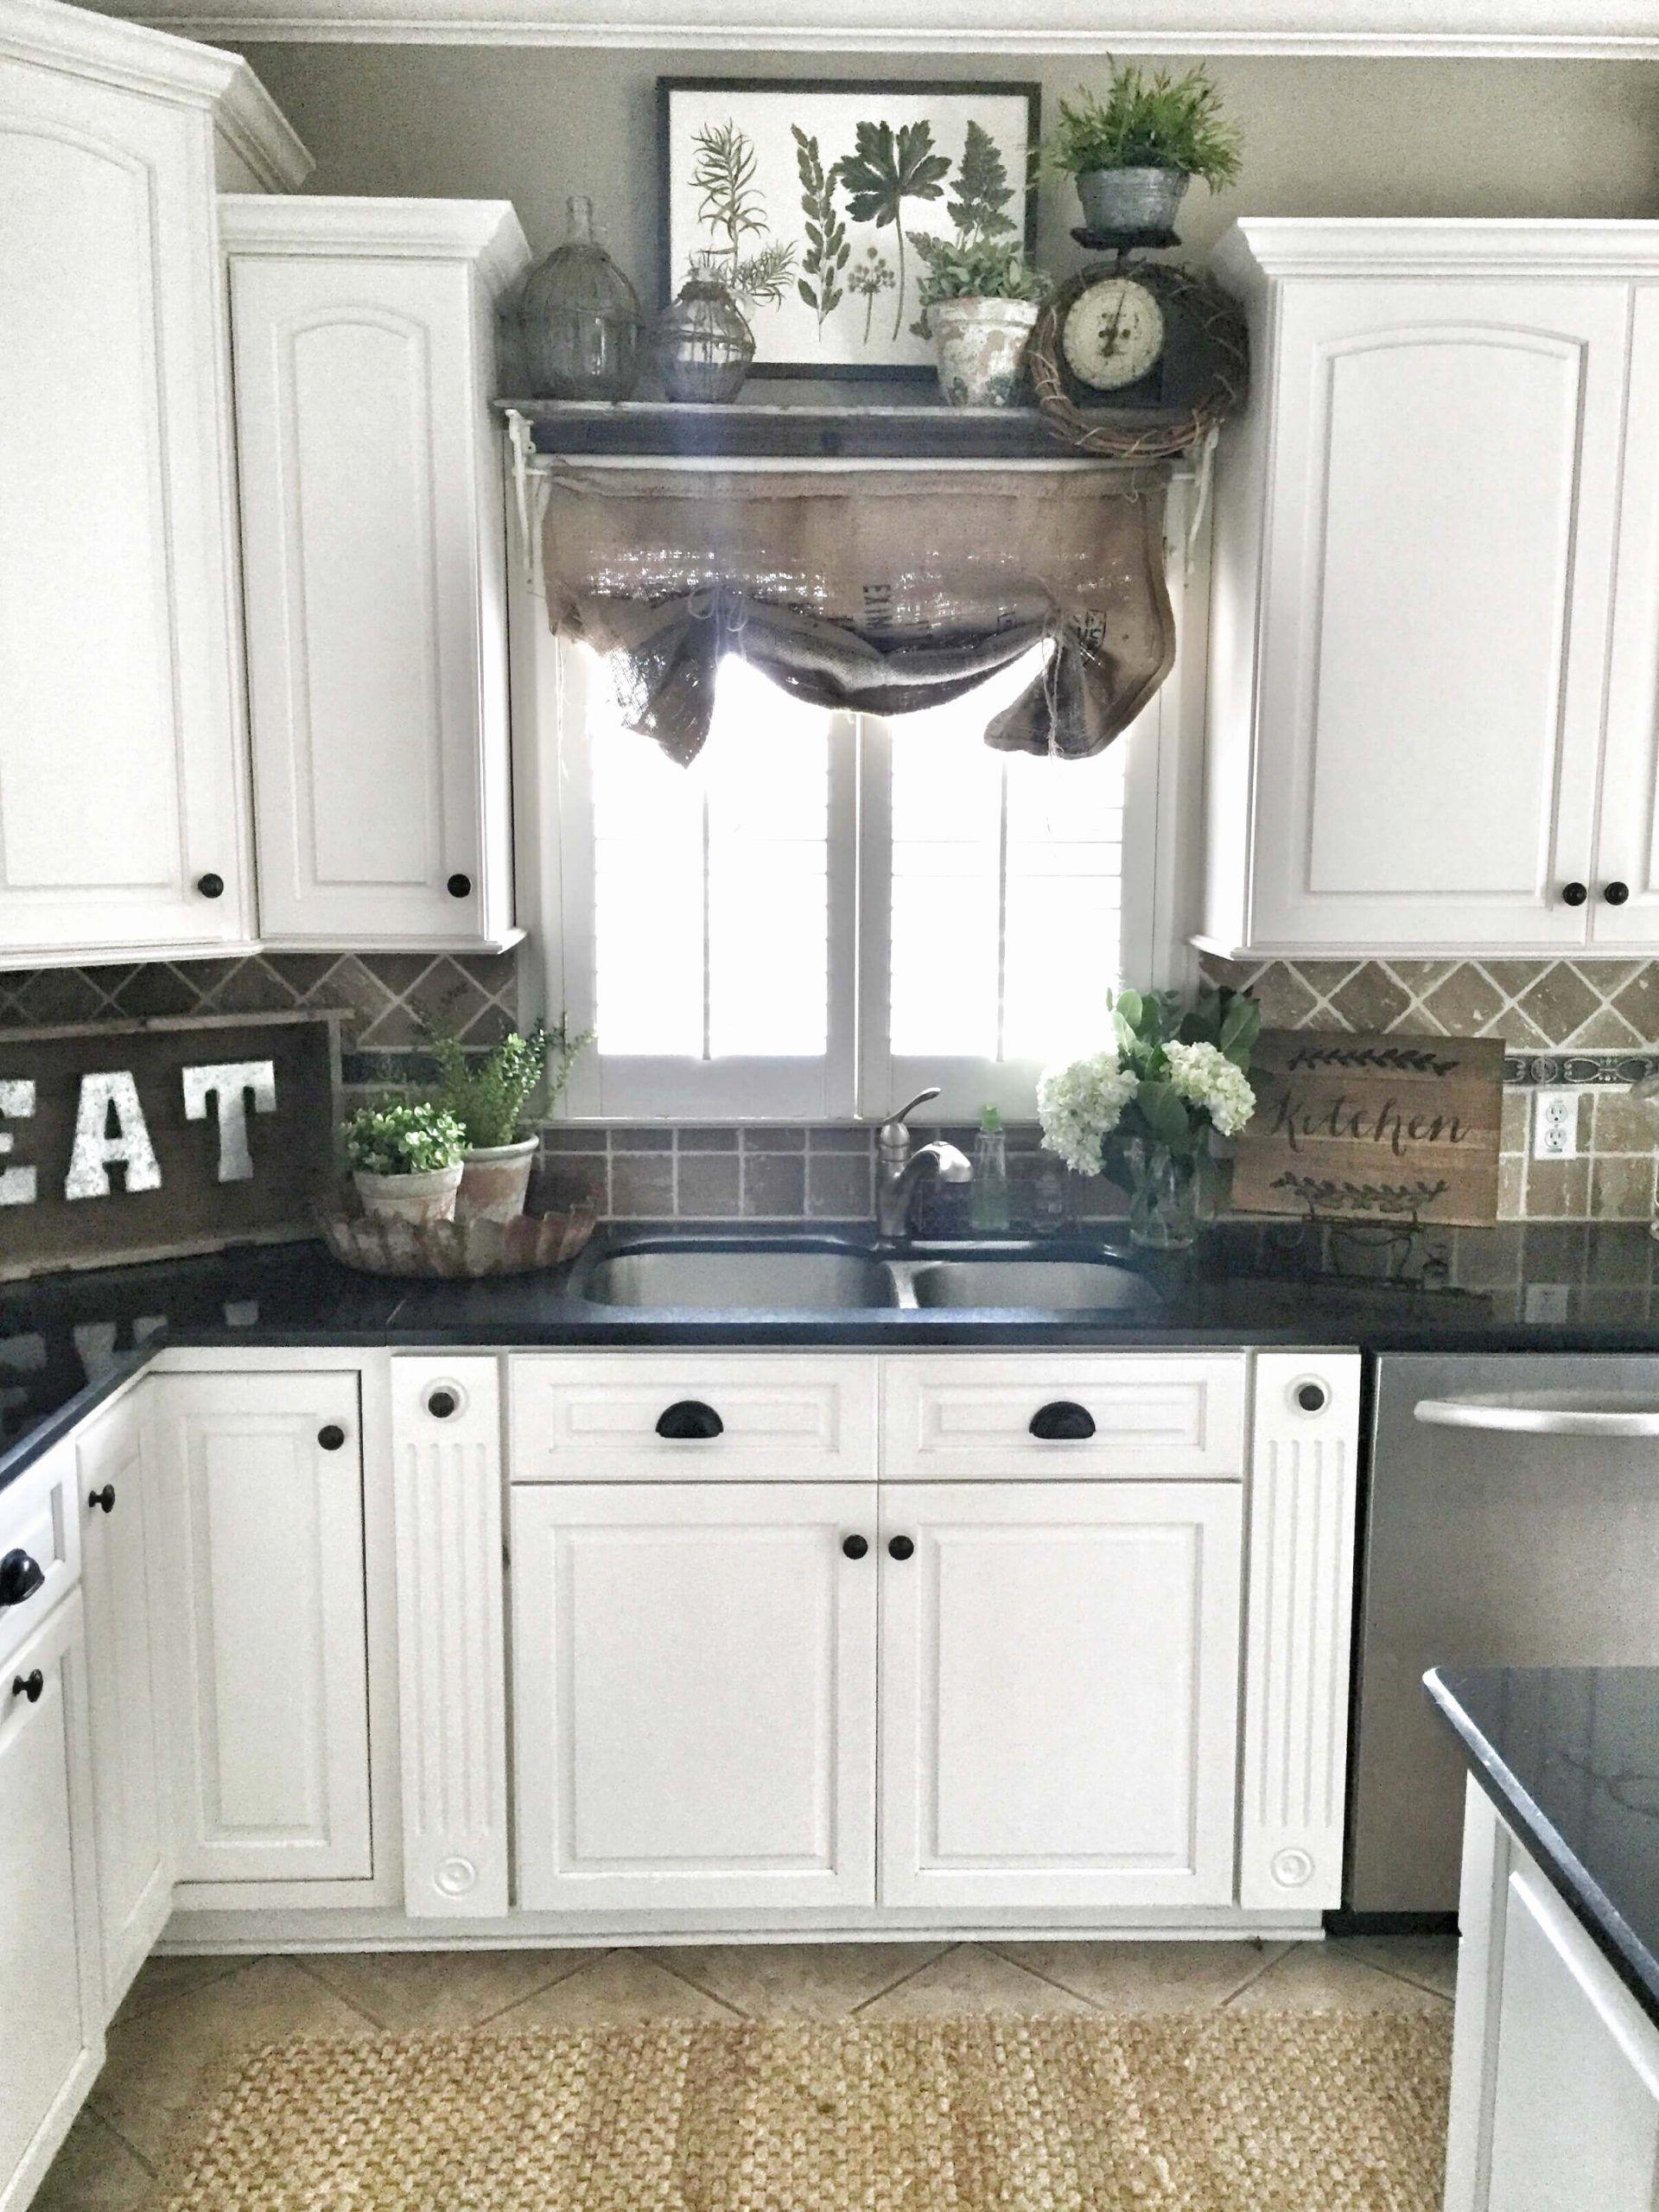 Refinishing Kitchen Cabinet Ideas Elegant 23 Best Kitchen Cabinets Painting Color Ideas And Designs Dekorasi Dapur Desain Dapur Renovasi Dapur Kecil